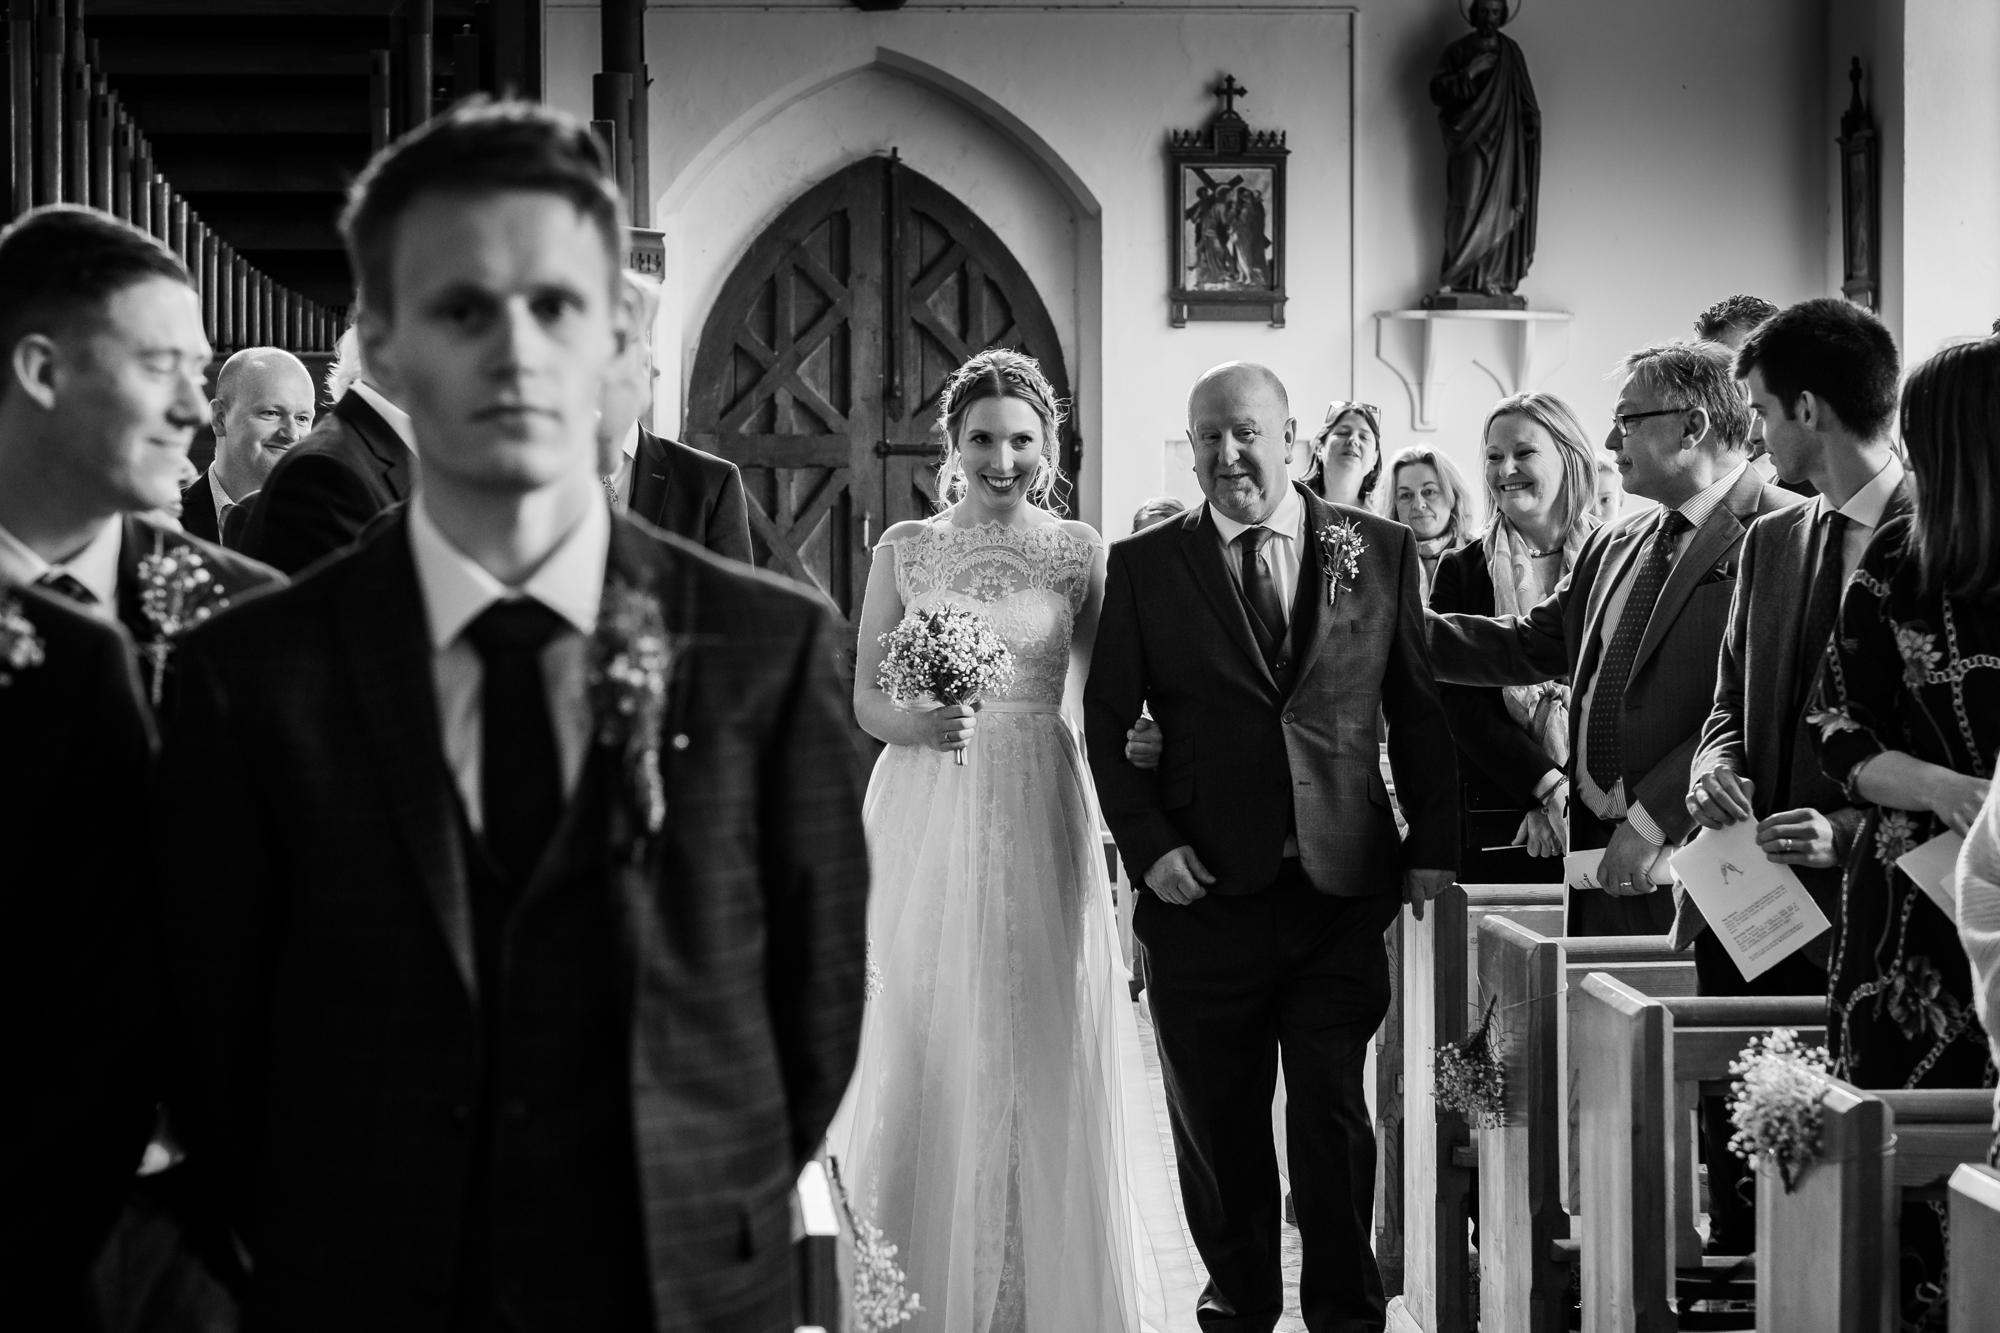 Katie and Dode weddings (47 of 207).jpg